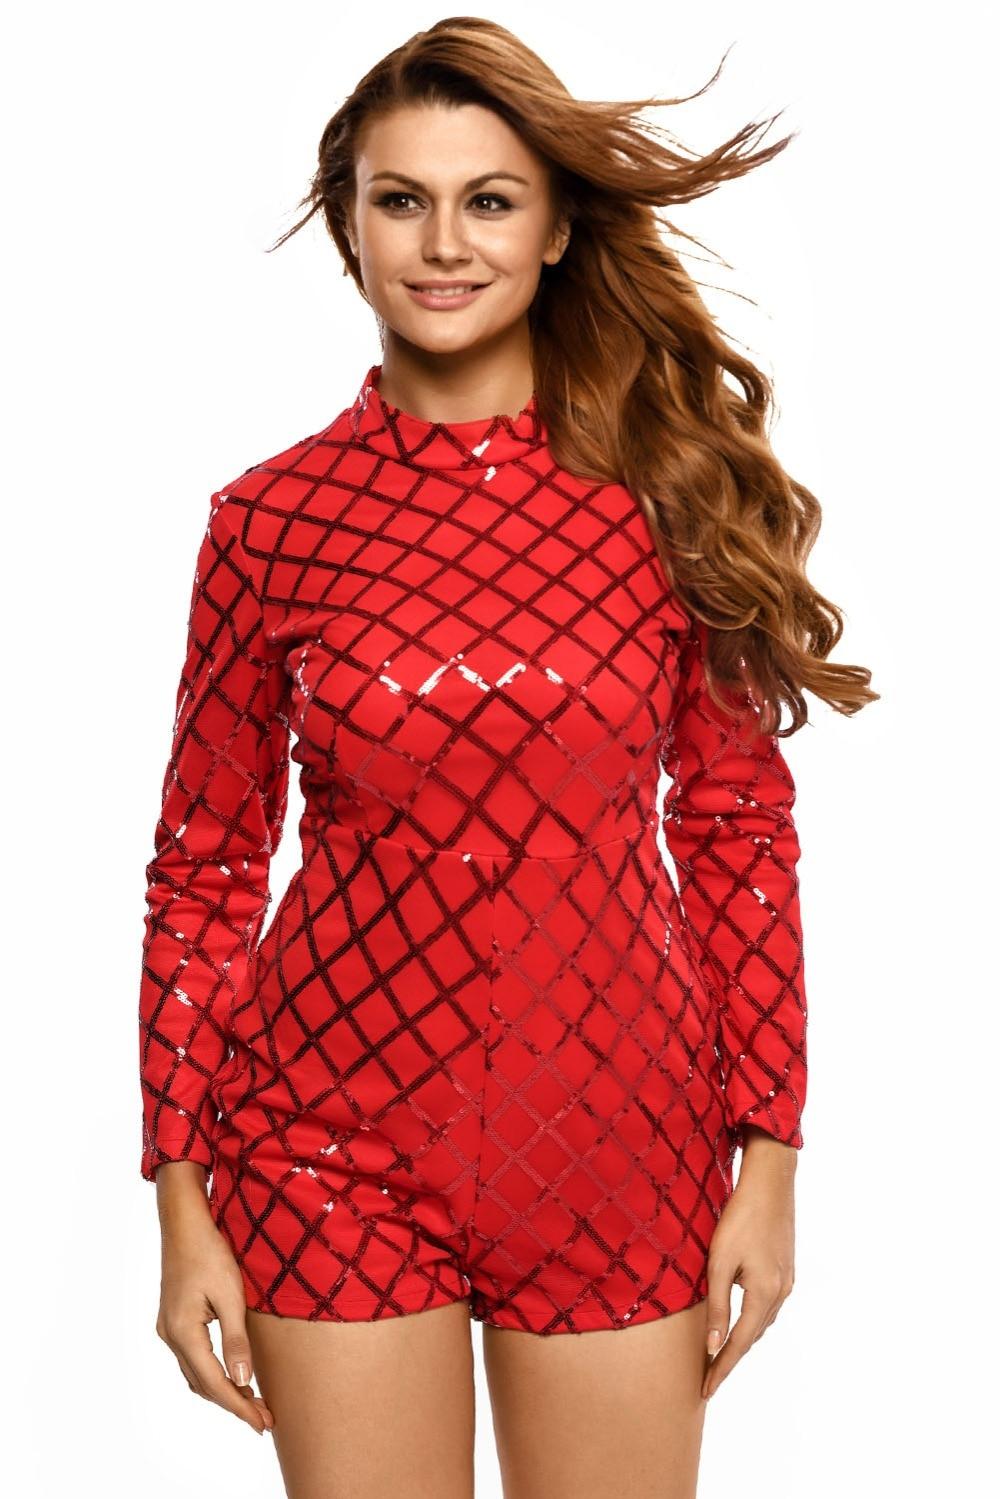 Adogirl Red Sequins Rompers Plus Size Women Plaid Jumpsuits 2016 Autumn  Lady Turtleneck Playsuits Playsuits One - Popular Sequin Turtleneck Jumpsuit-Buy Cheap Sequin Turtleneck